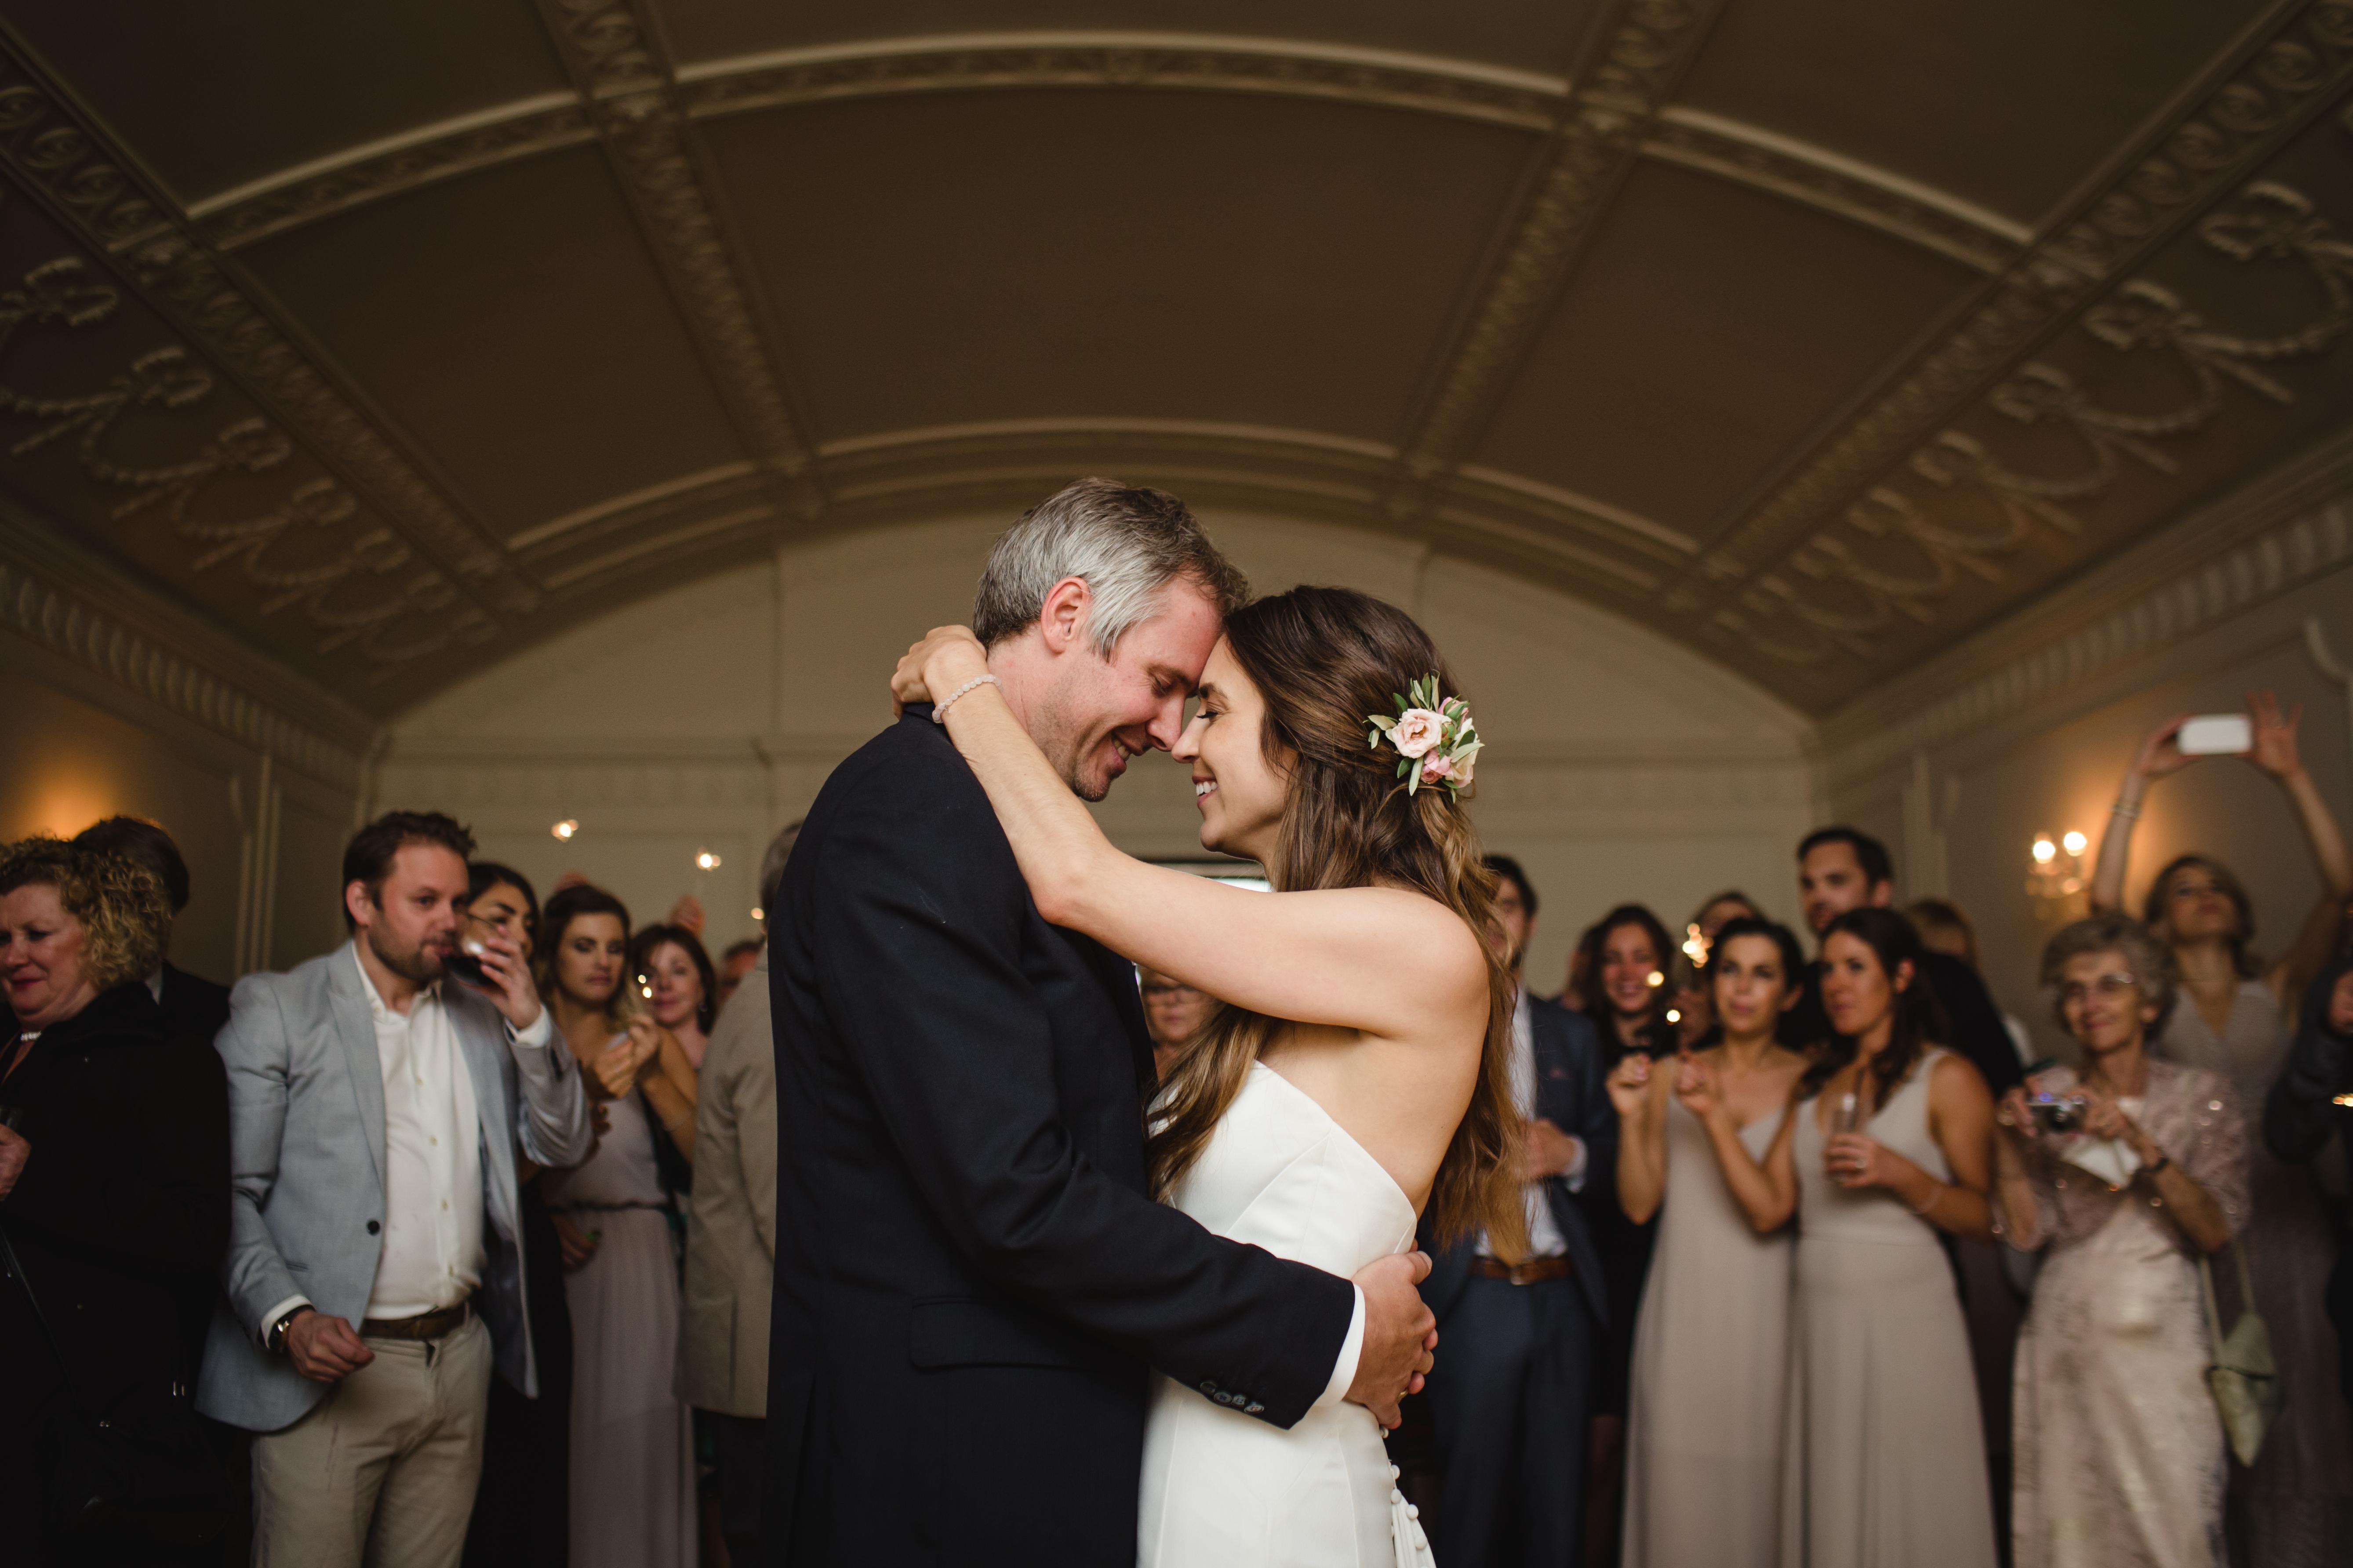 Sarah Amp Stephen S Intimate Mansion Wedding Amanda